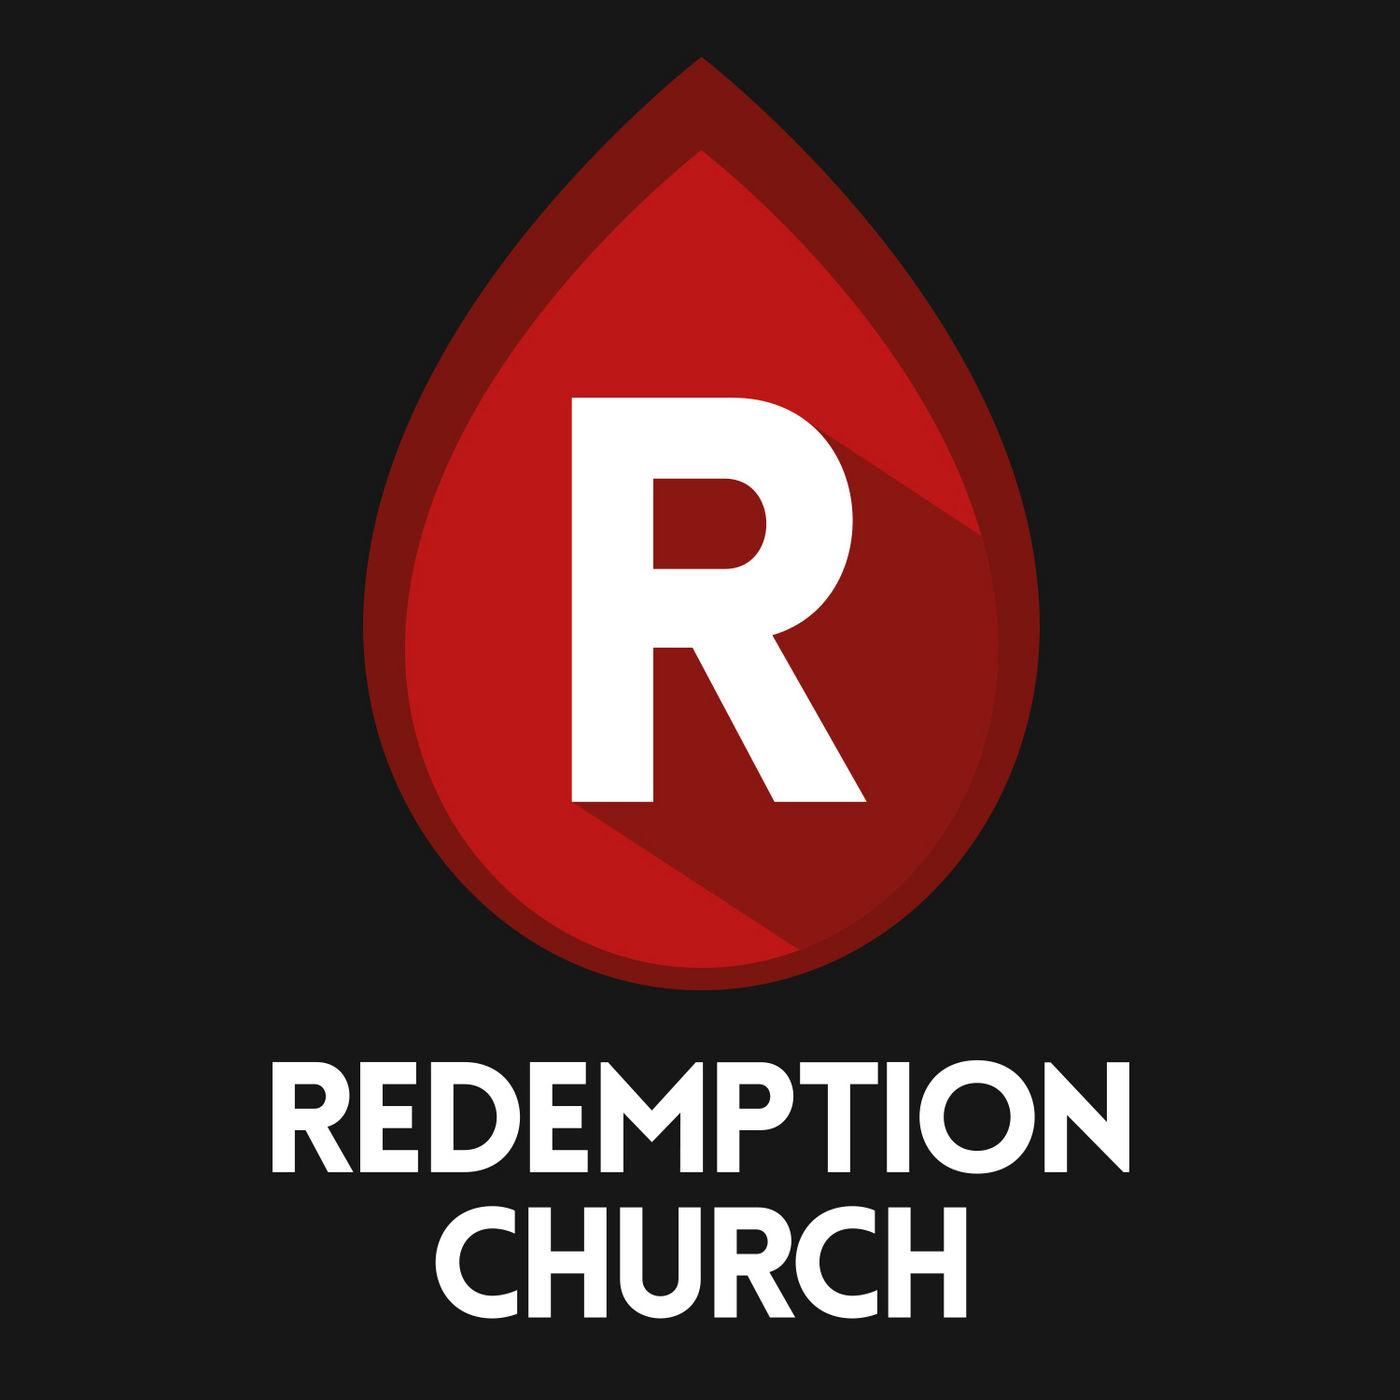 Redemption Church Melbourne